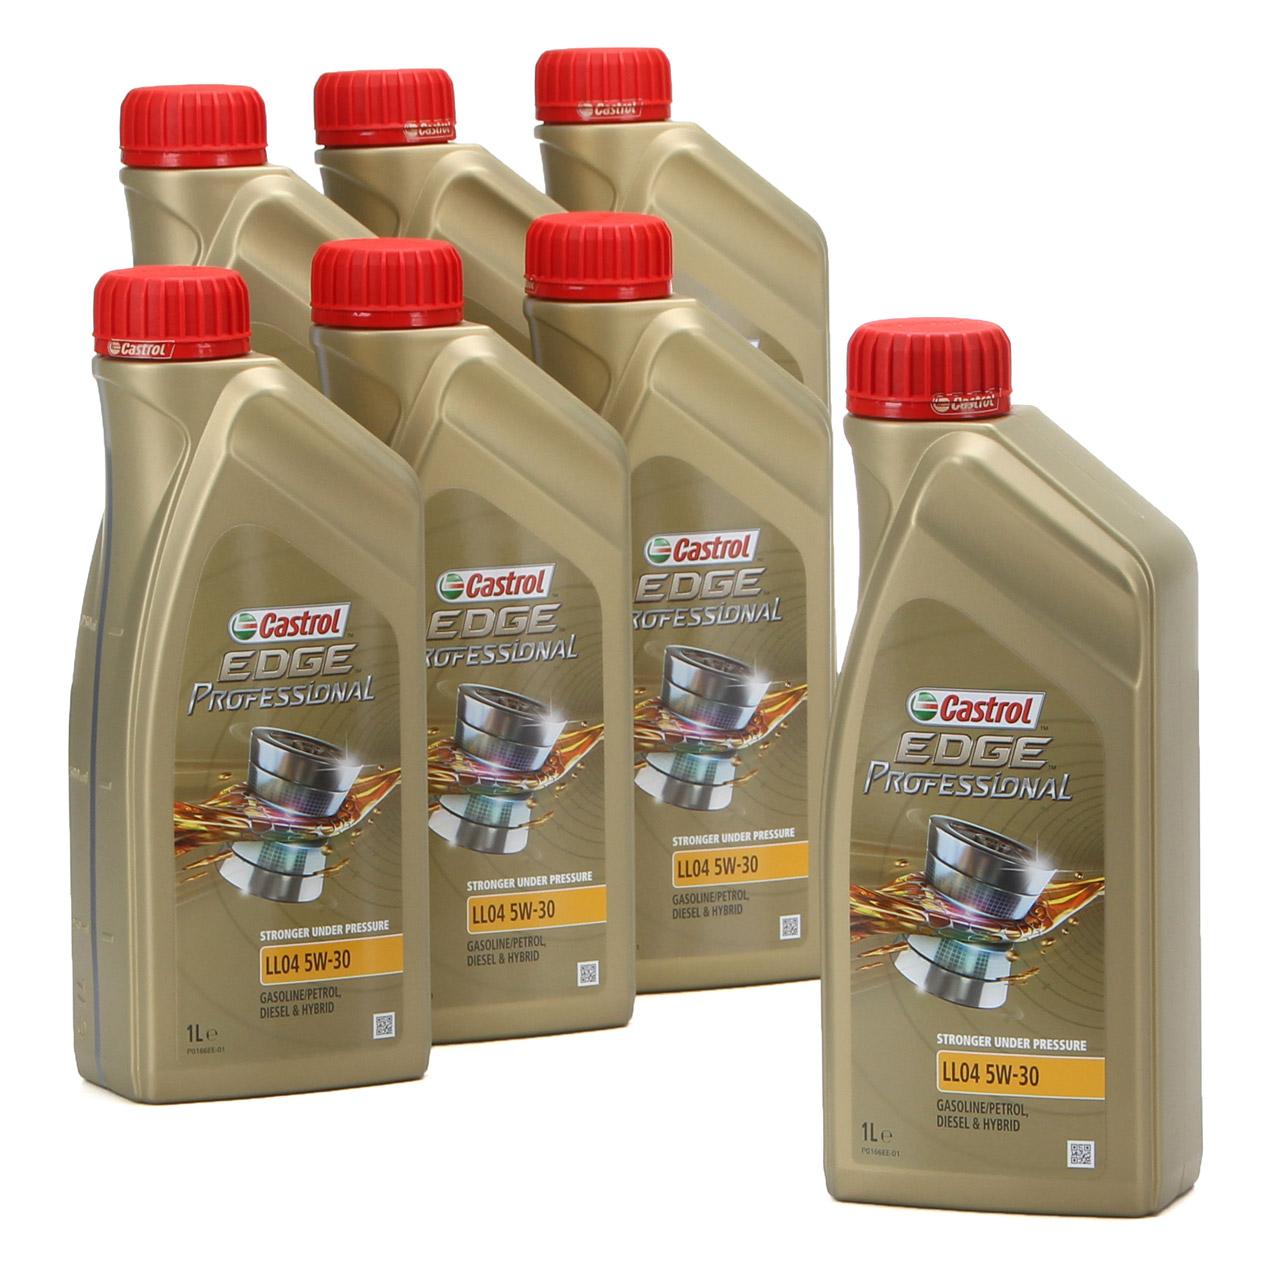 CASTROL EDGE Professional Motoröl Öl für BMW Longlife IV LL04 5W-30 - 7 Liter